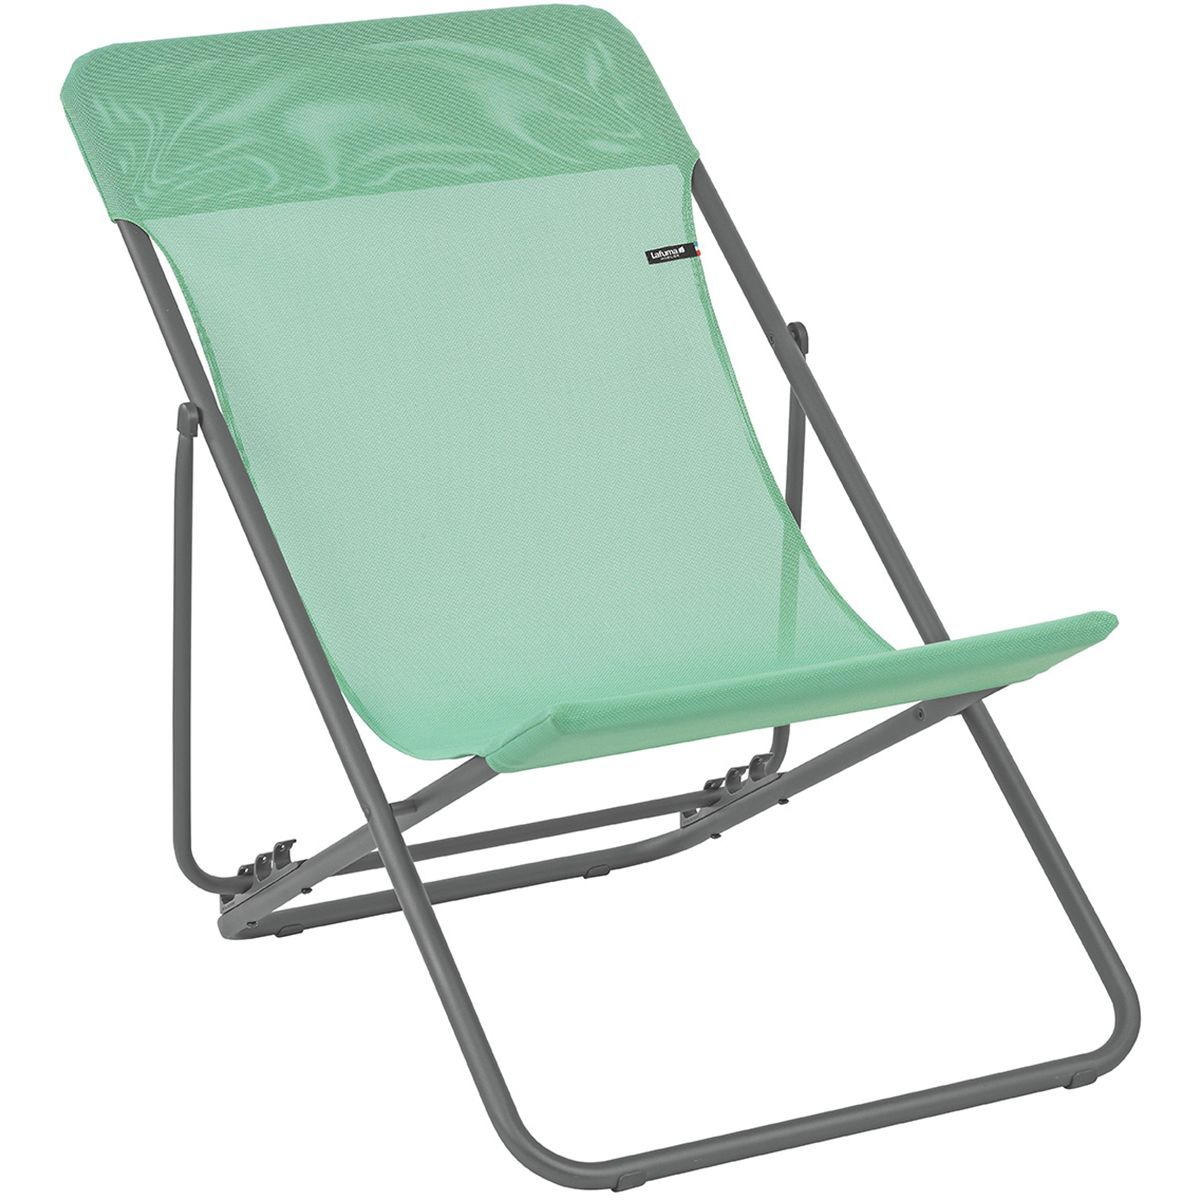 Maxi Transat Camp Chair